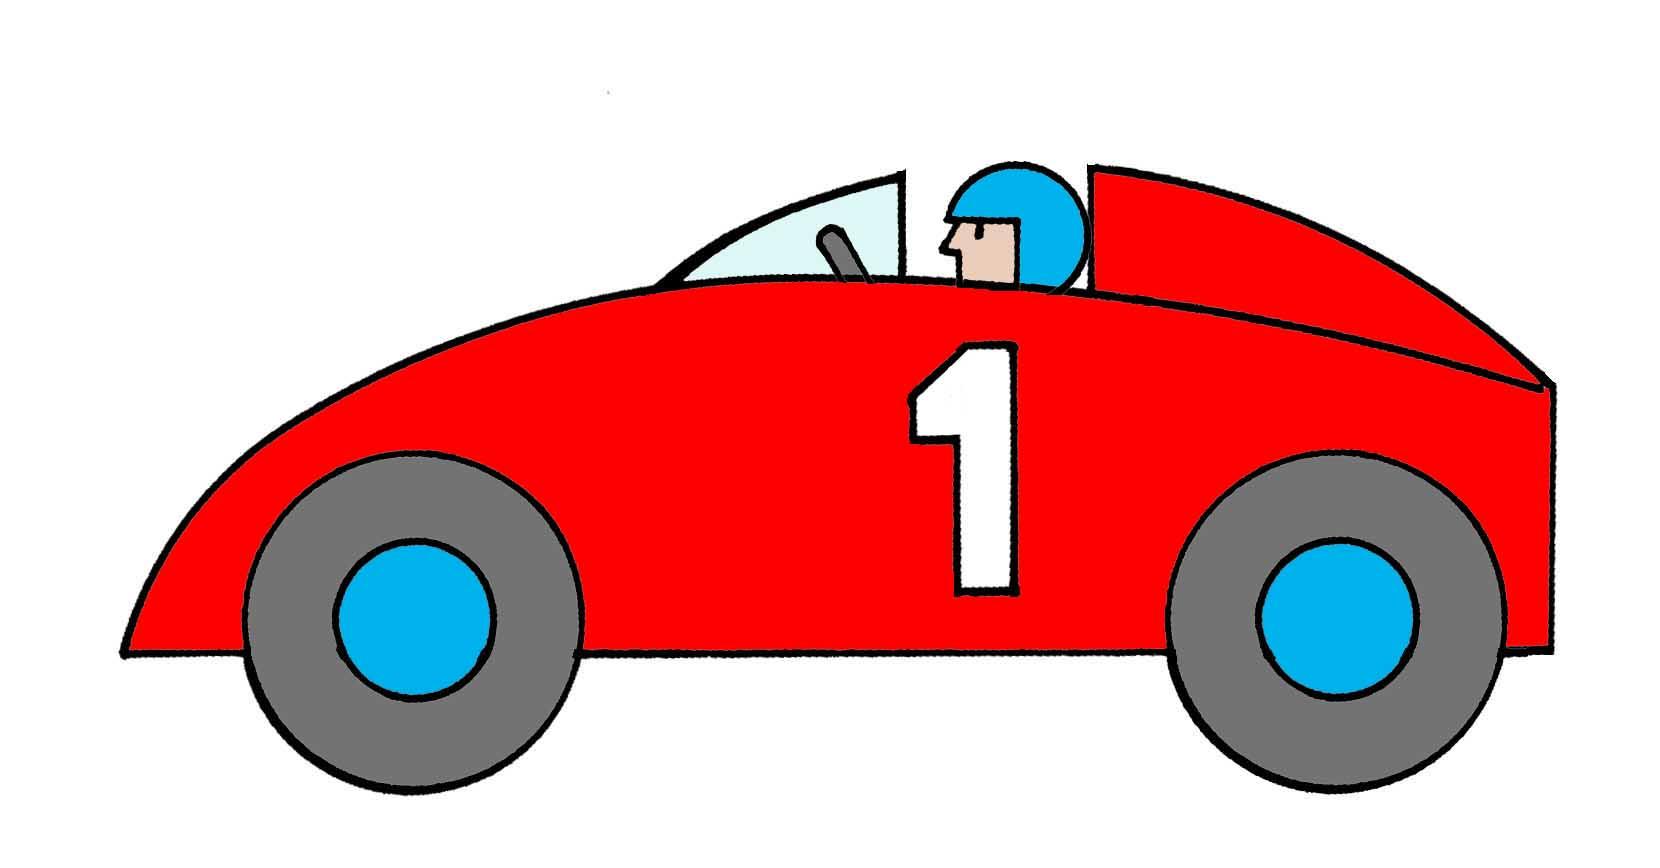 Free Cartoon Racing Car, Download Free Clip Art, Free Clip.